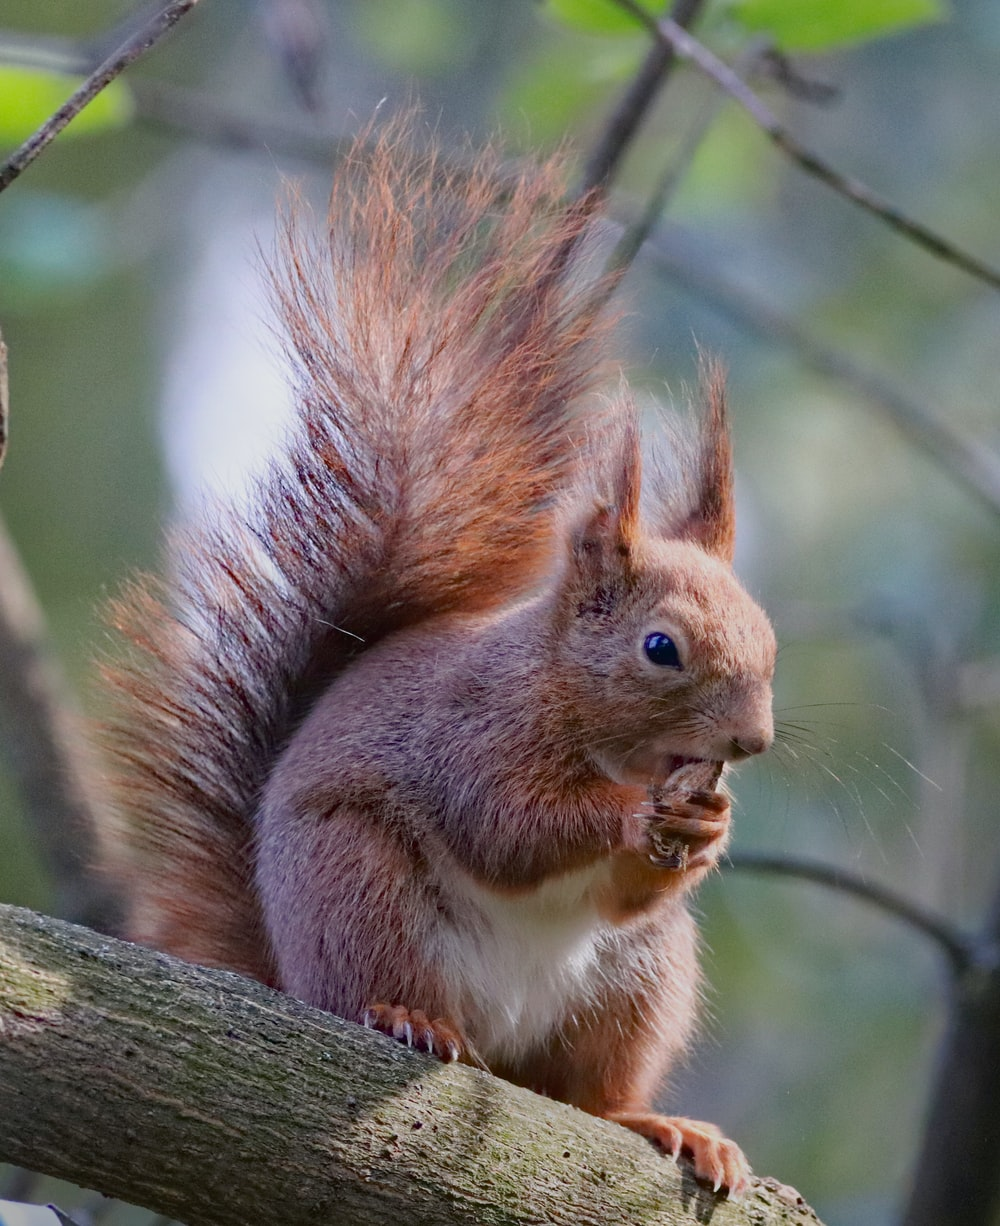 brown squirrel on tree eating nut